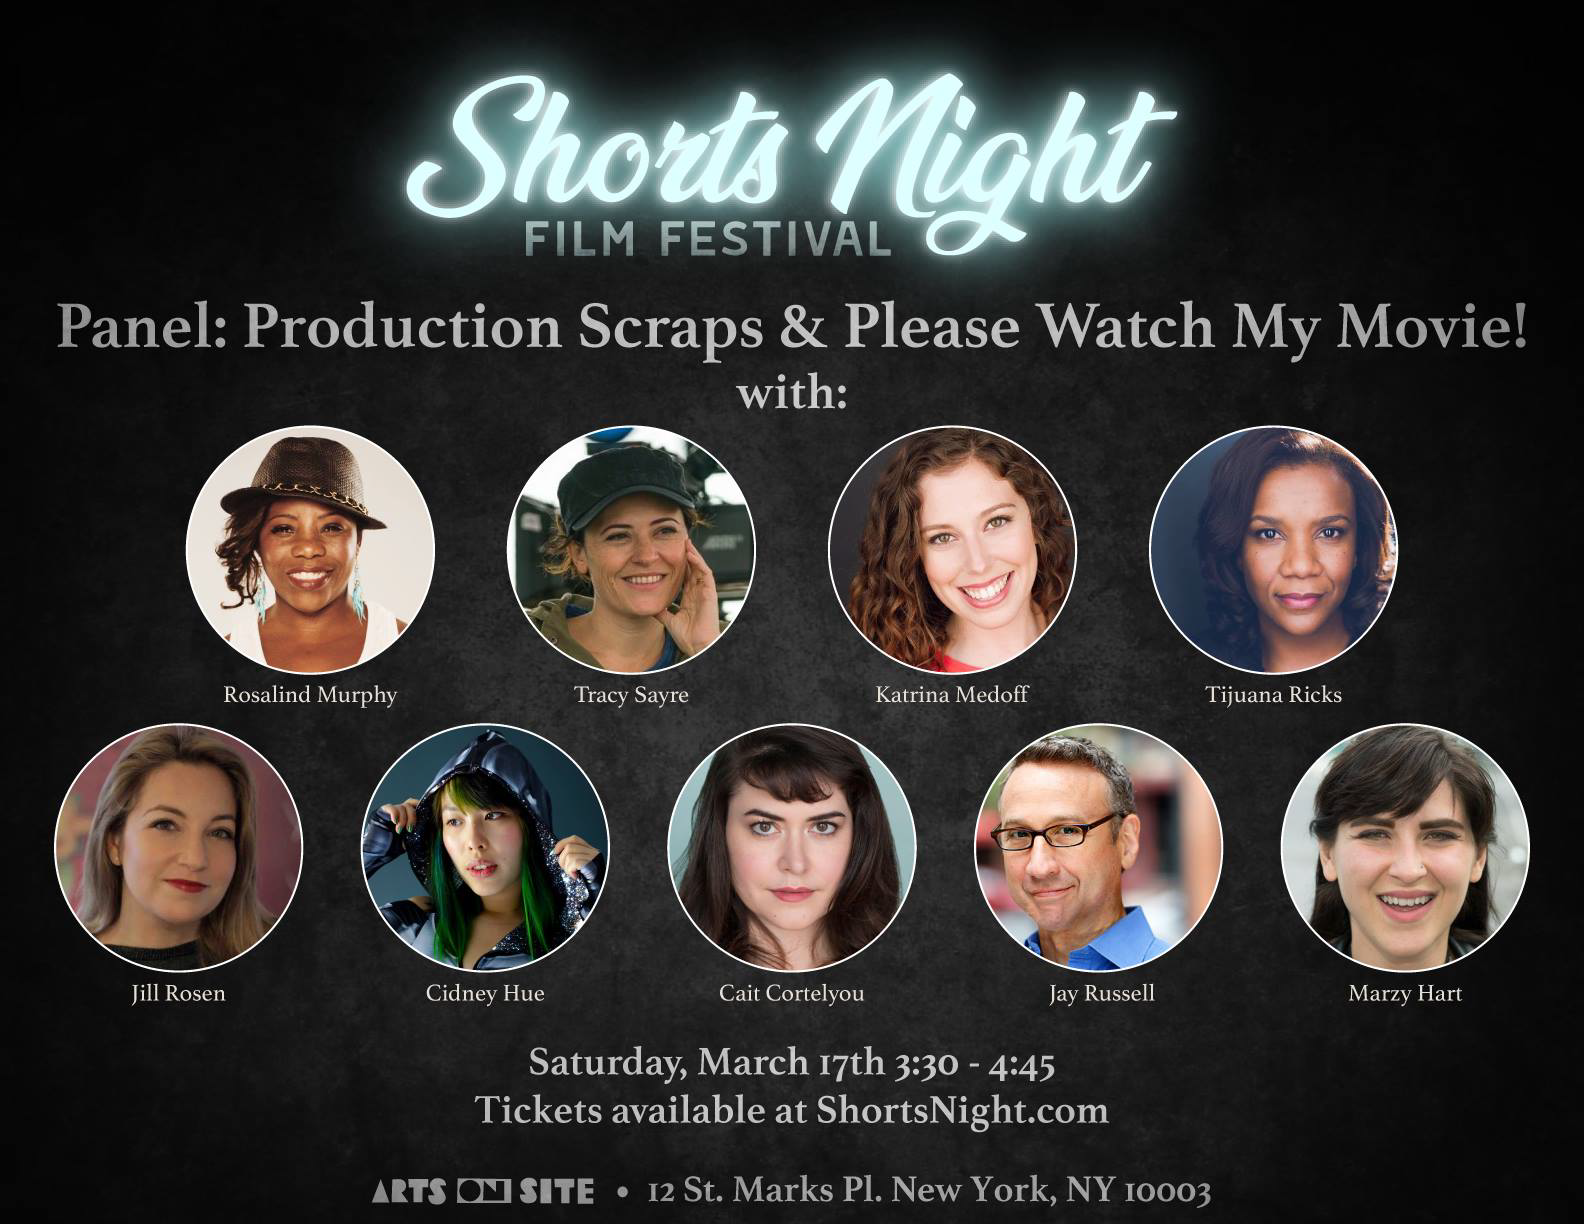 Shorts Night Film Fest_Panelists